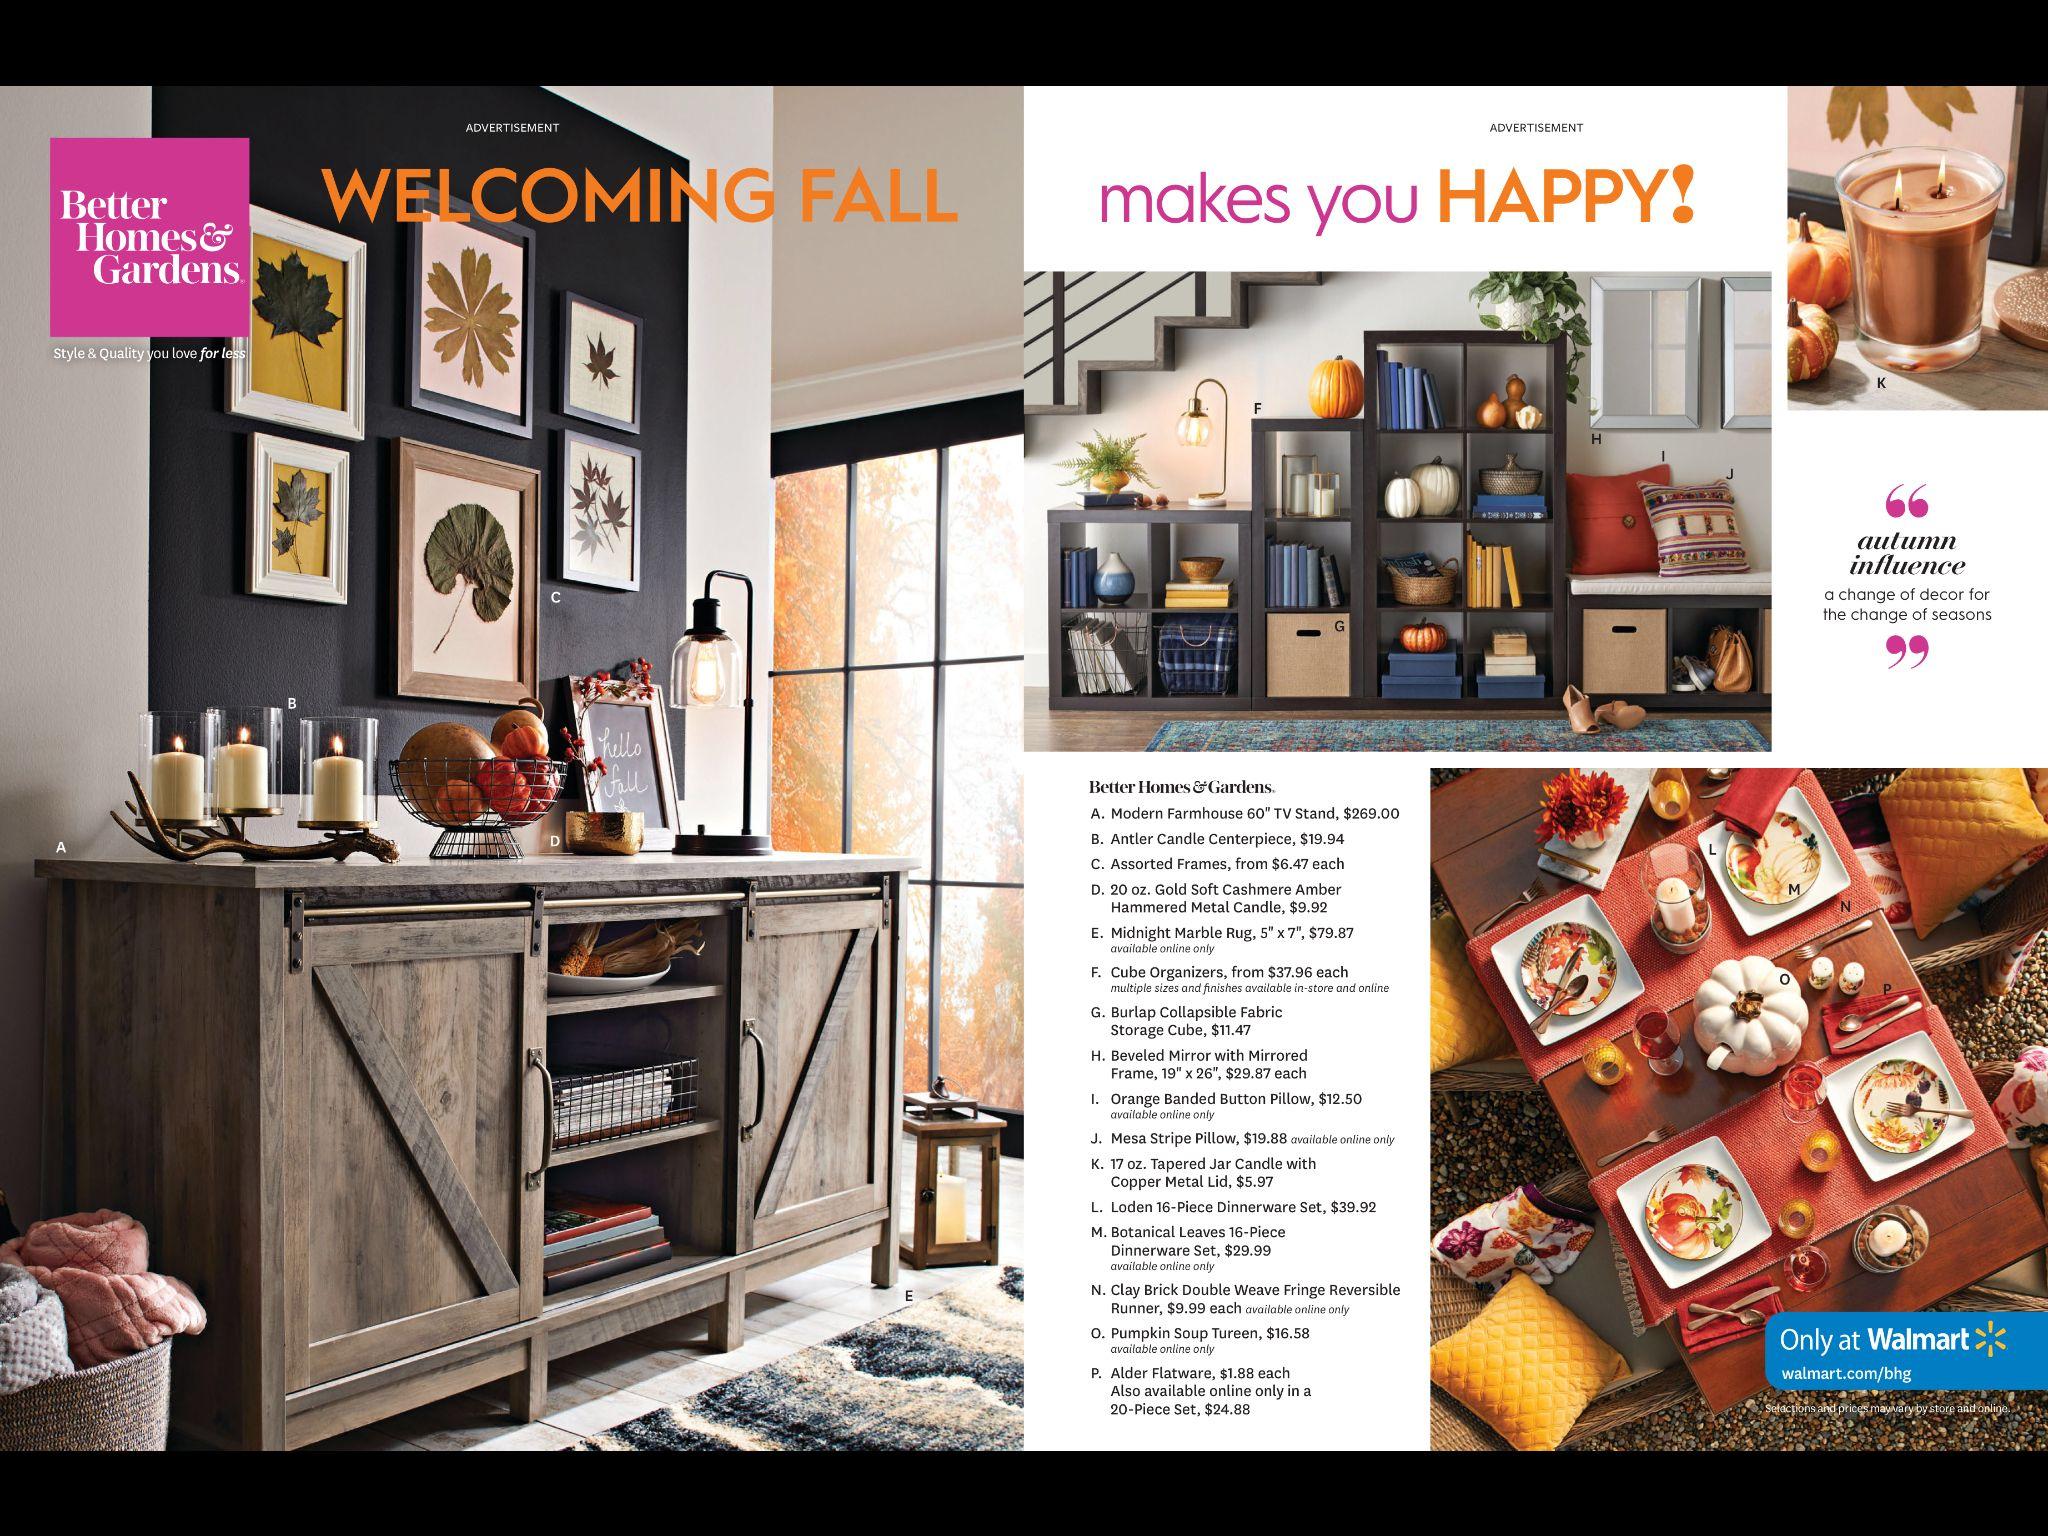 fd6a9c80d63c07ee2fc0ec21c9c2c161 - Better Homes And Gardens Online Store